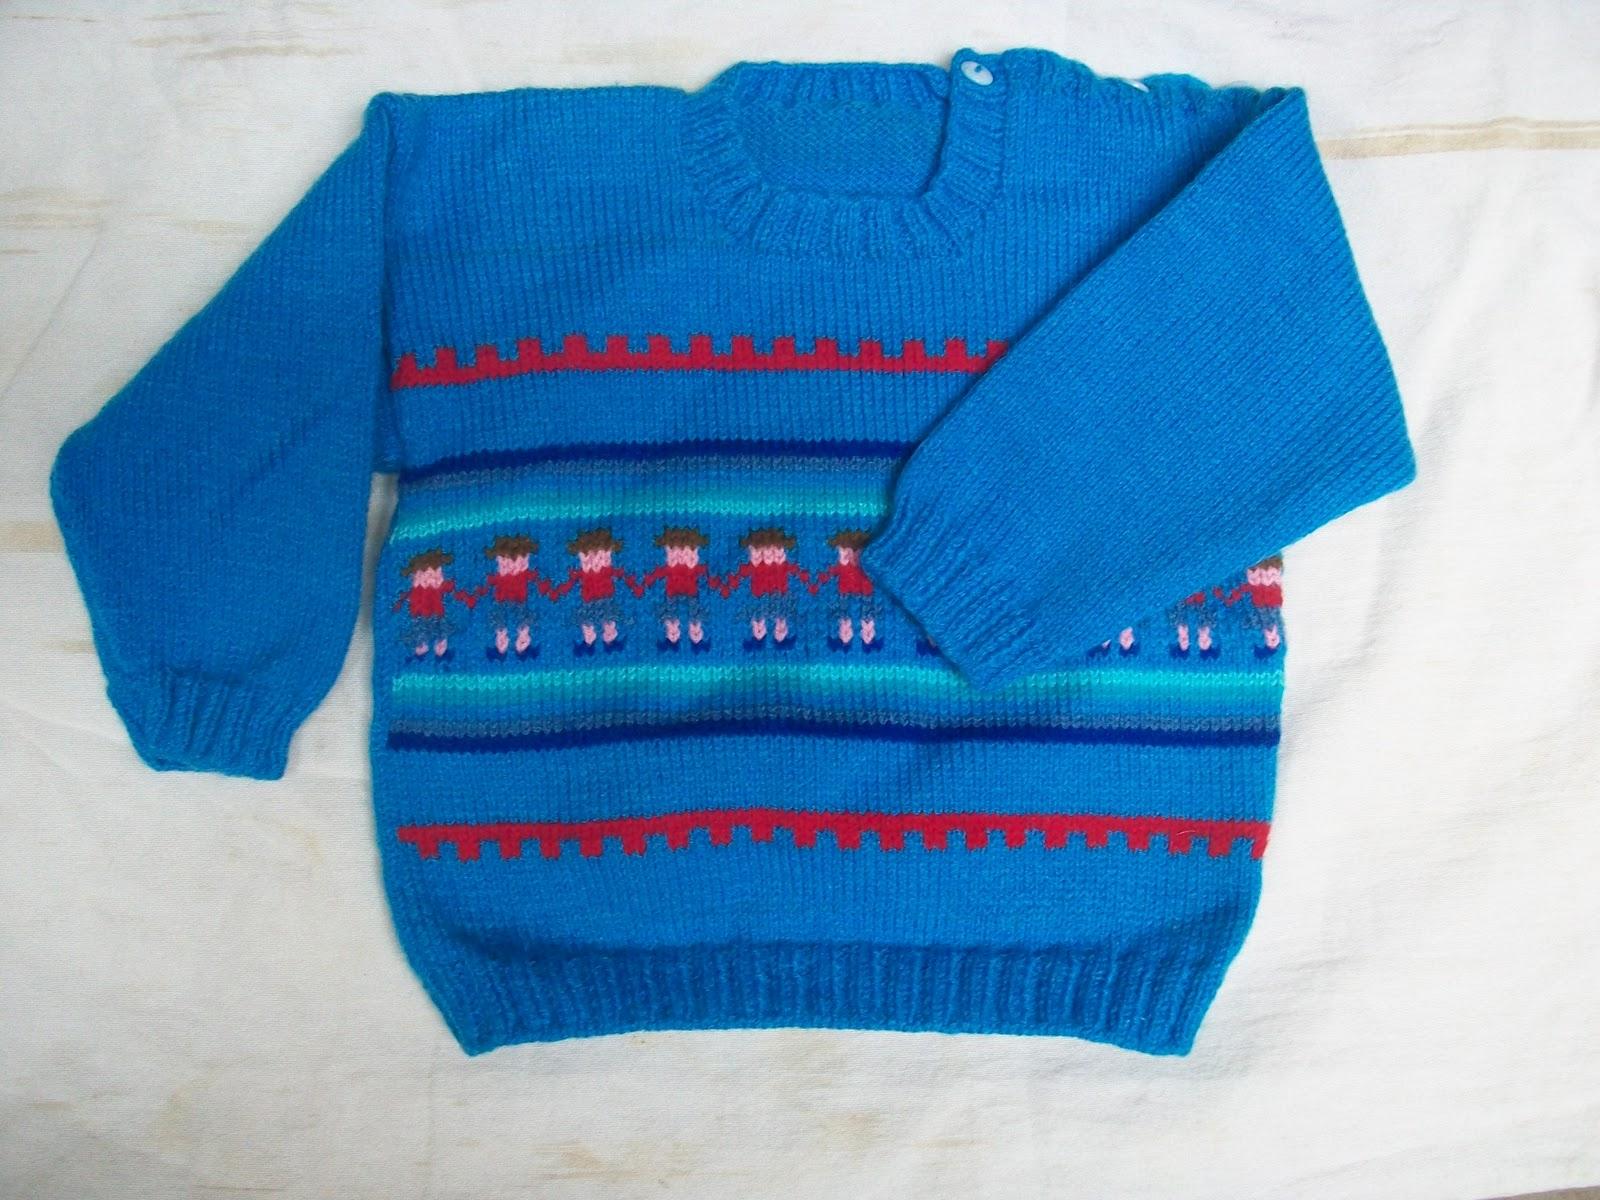 Chompas tejidos a palitos para niños - Imagui